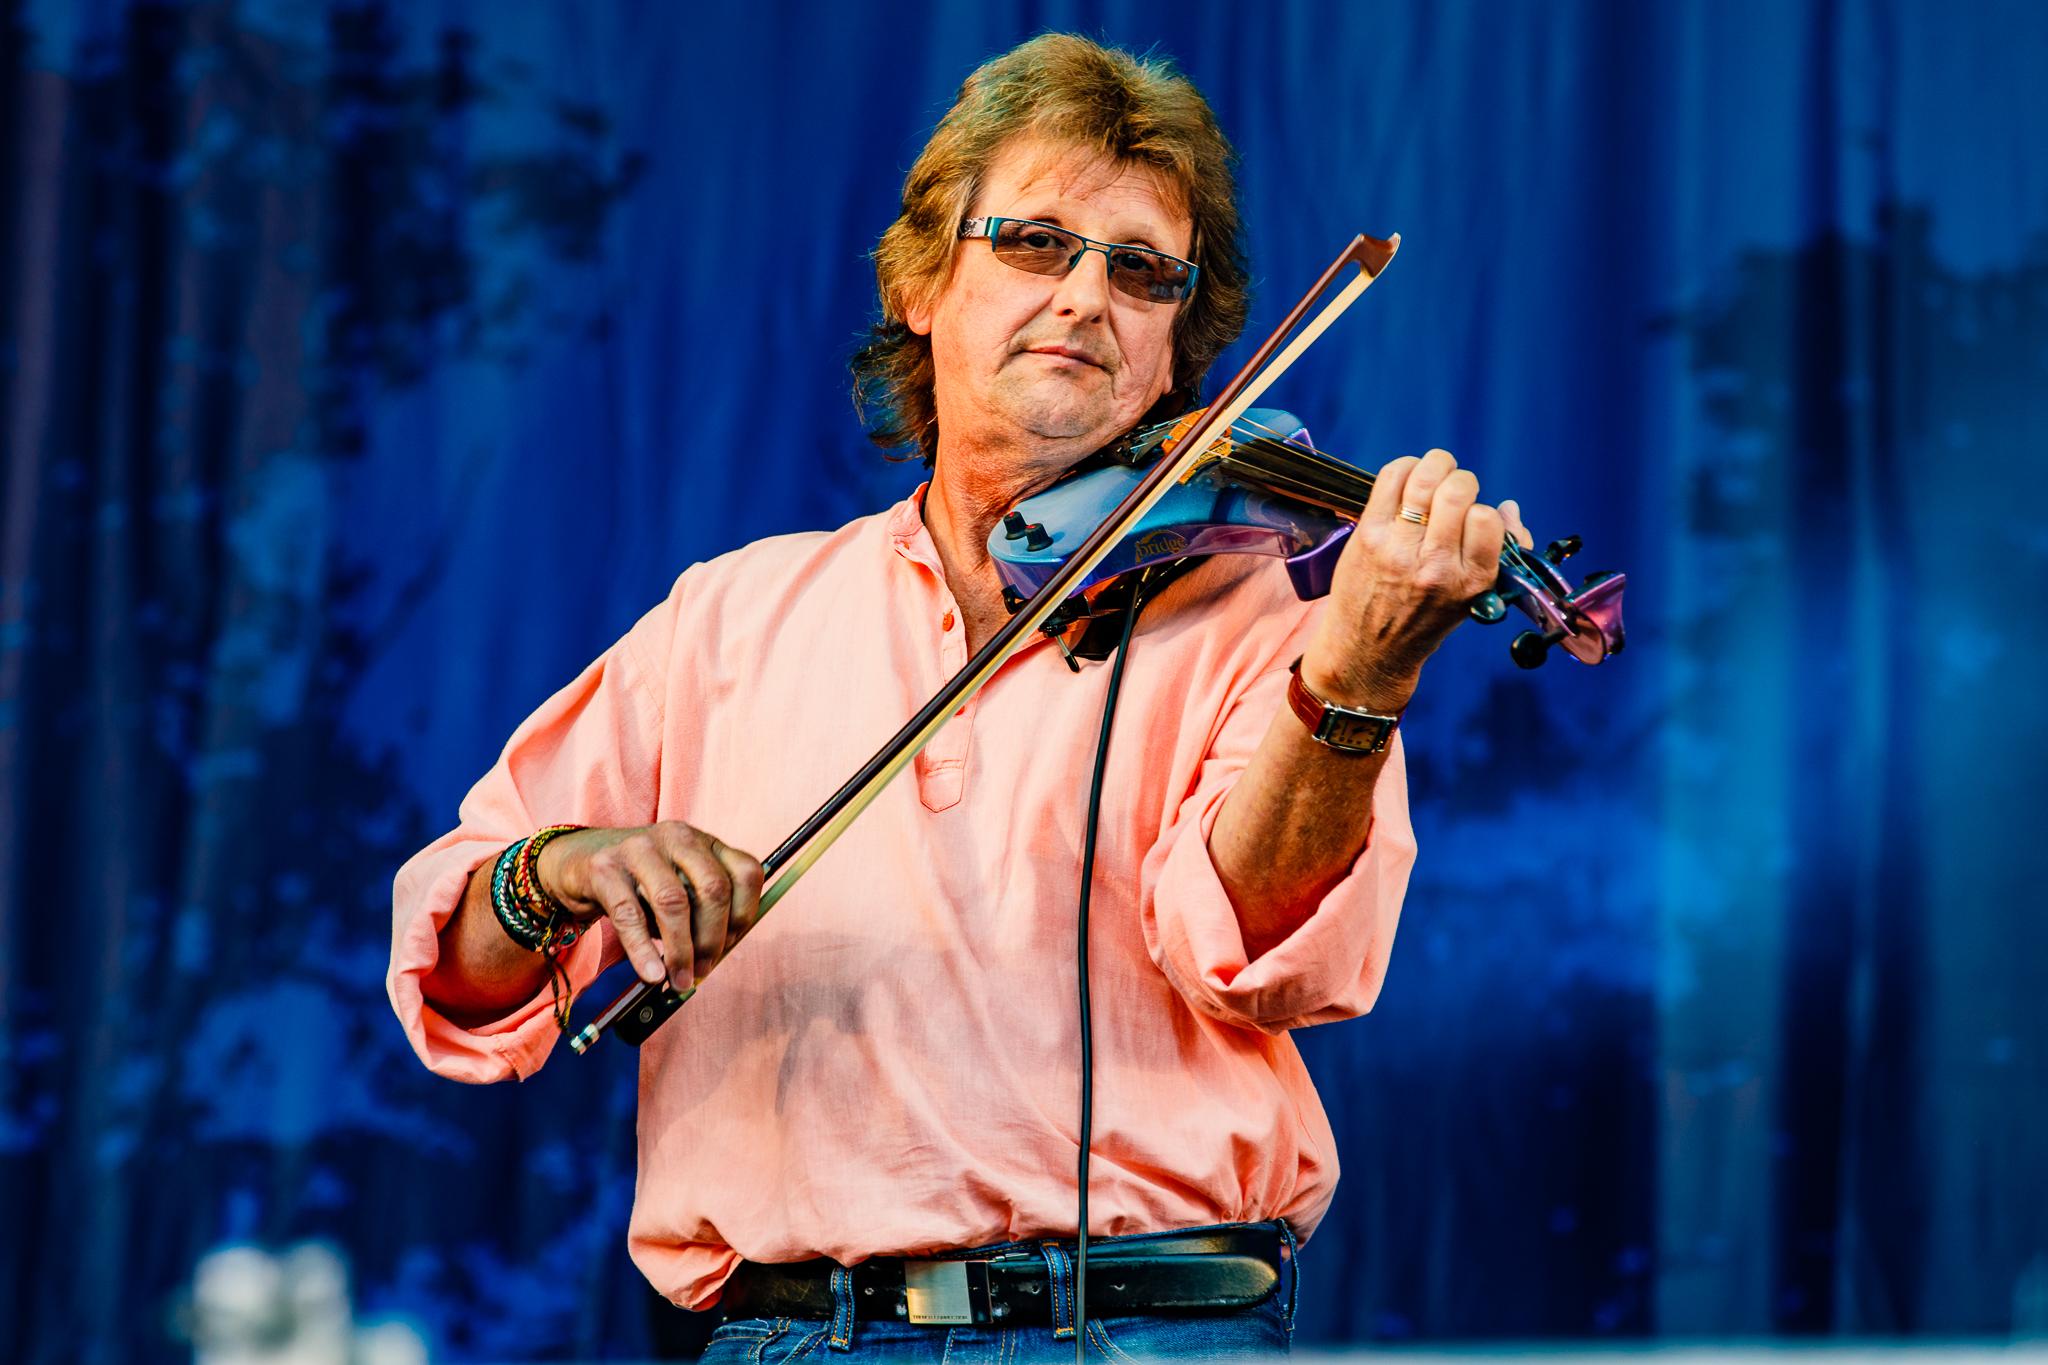 Feast of Fiddles at Fairport's Cropredy Convention (photo by Matt Condon / @arcane93)